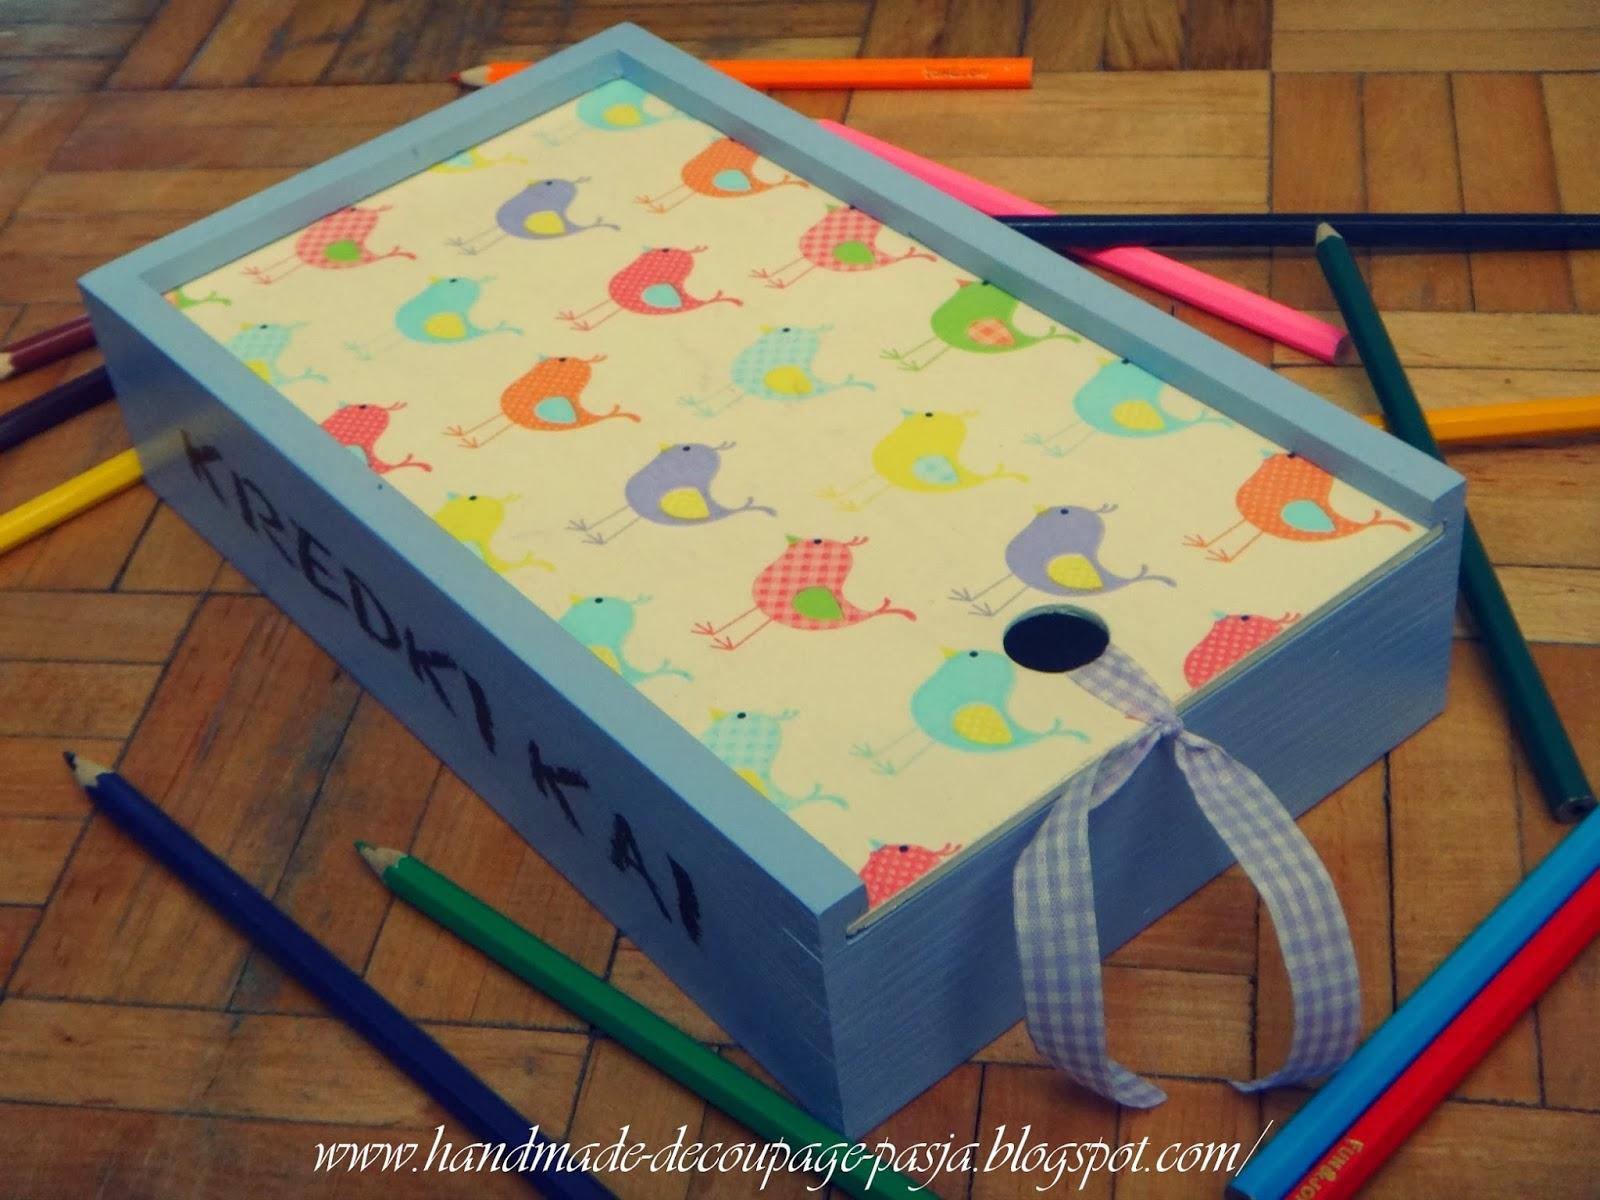 http://handmade-decoupage-pasja.blogspot.com/2014/01/kolorowe-kredkiw-pudeeczku-nosze.html